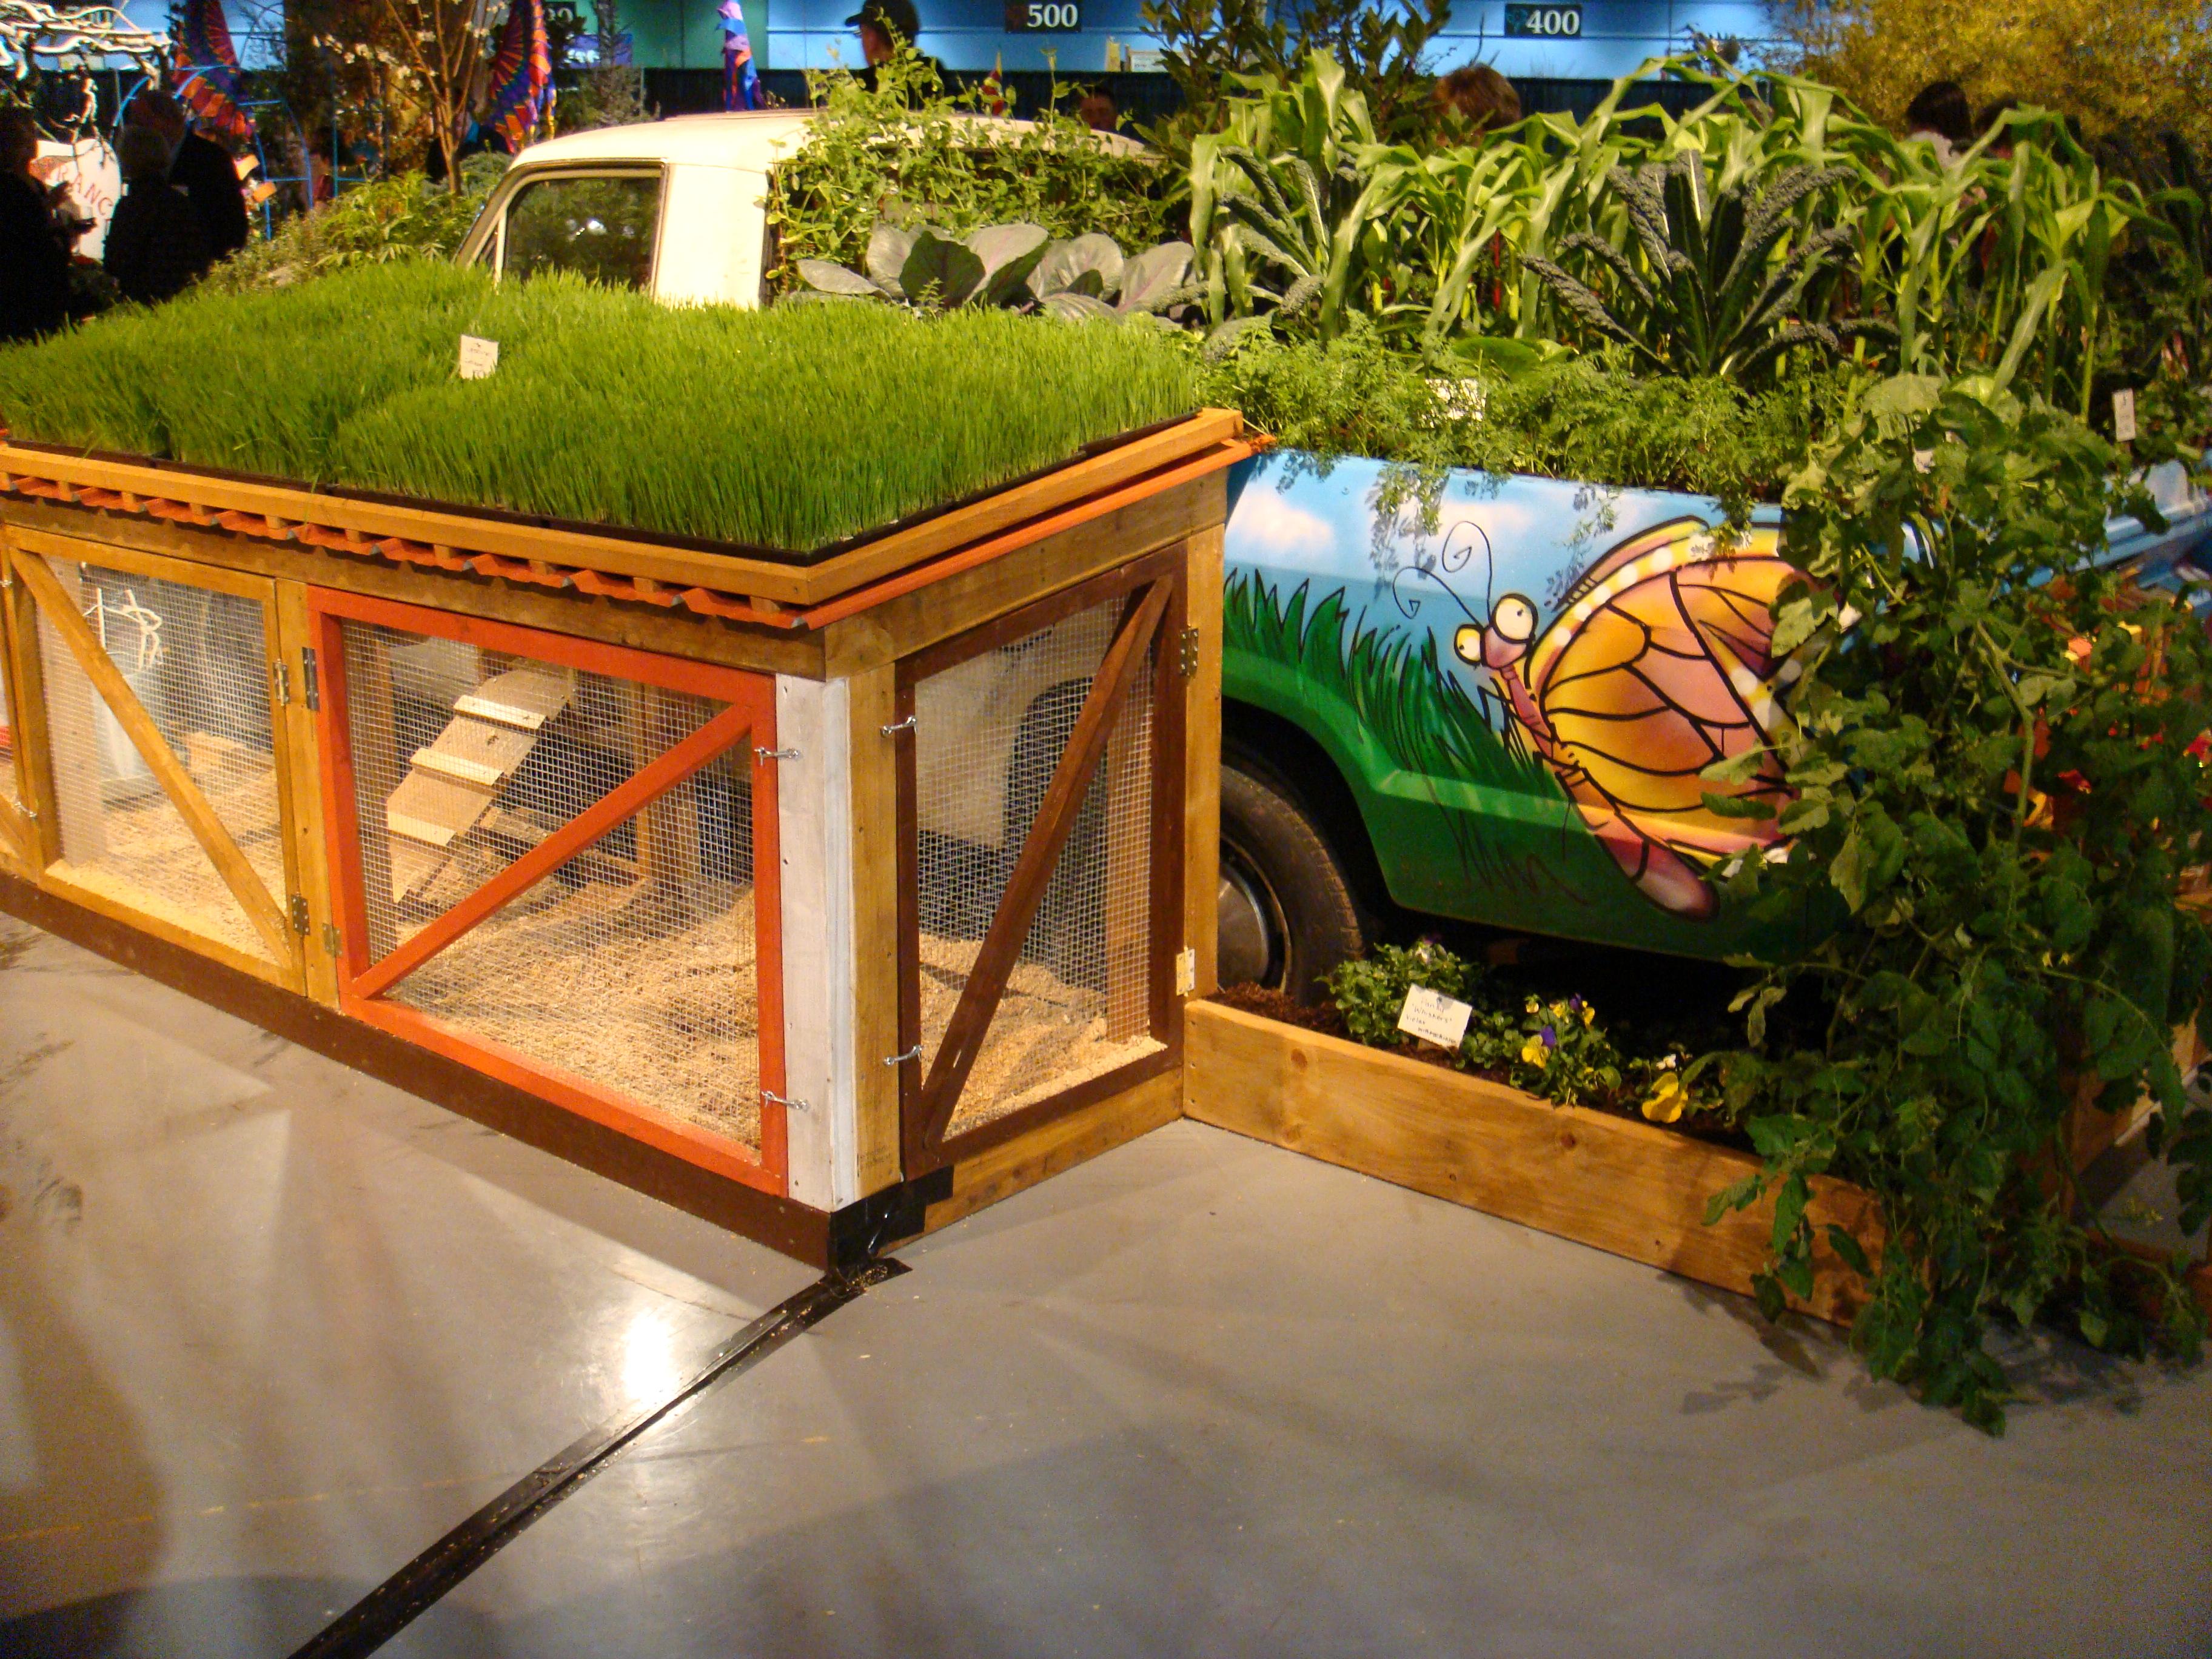 Display home garden designs - Though